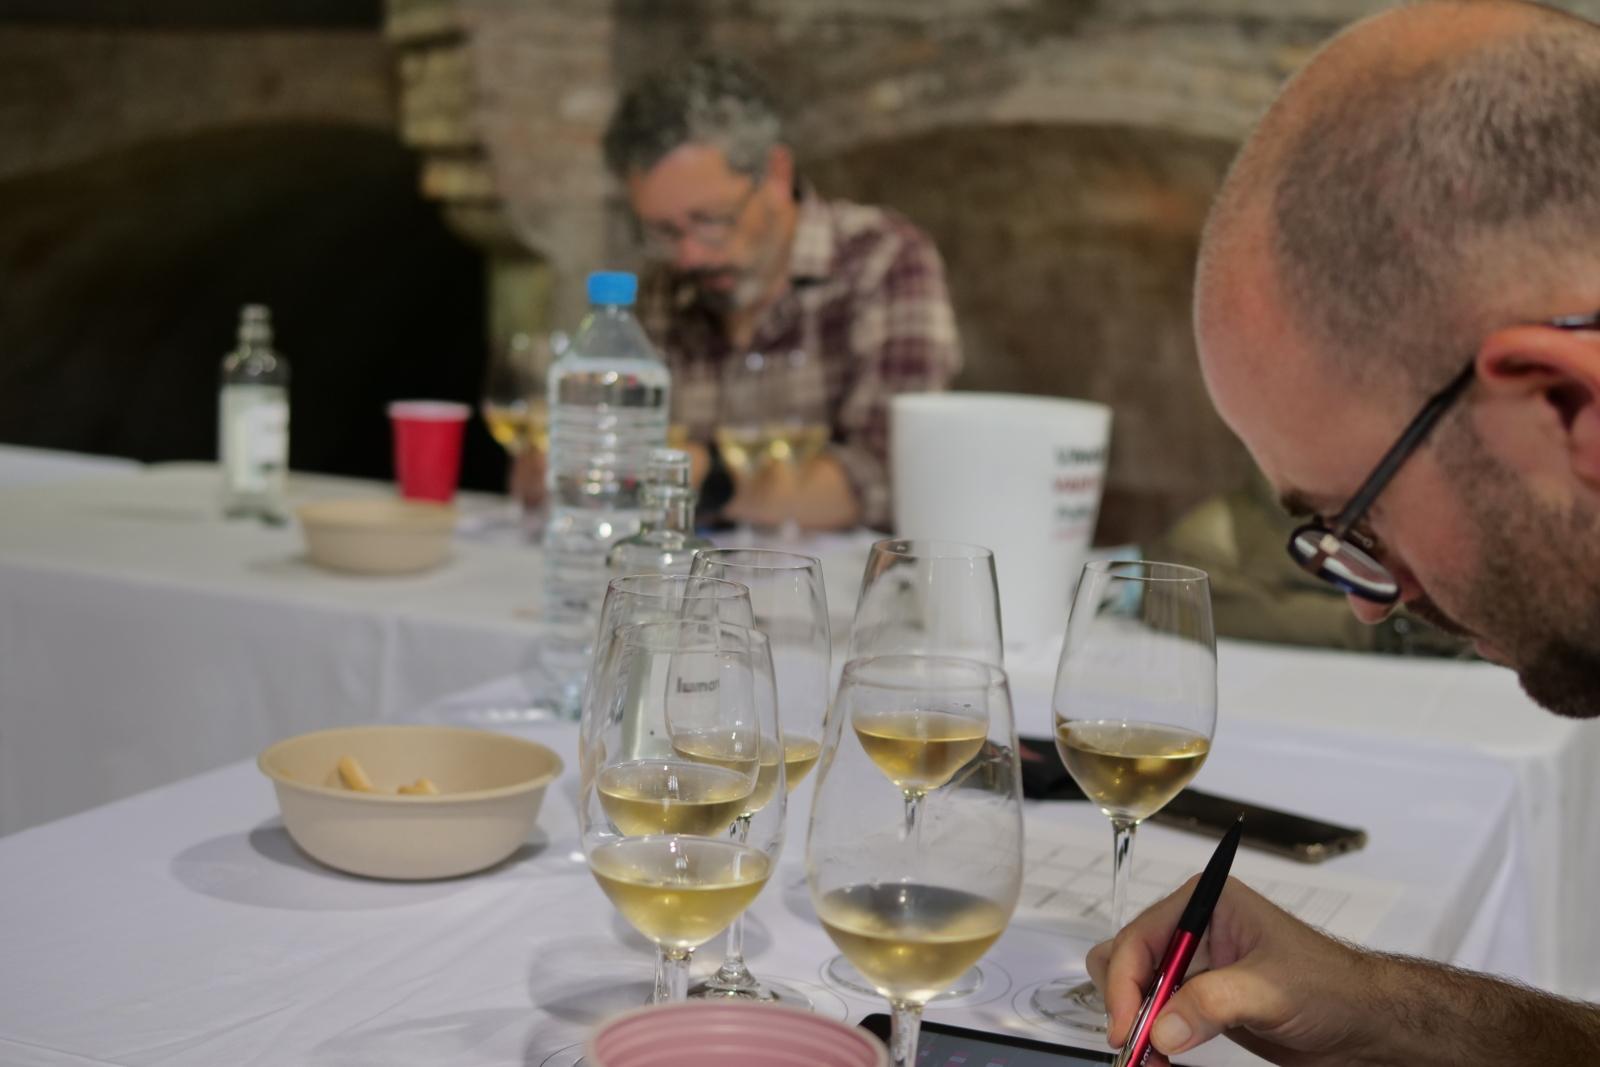 Tast Final Premis Vinari Rubí 2021 |Guillem Gandol, Vadevi